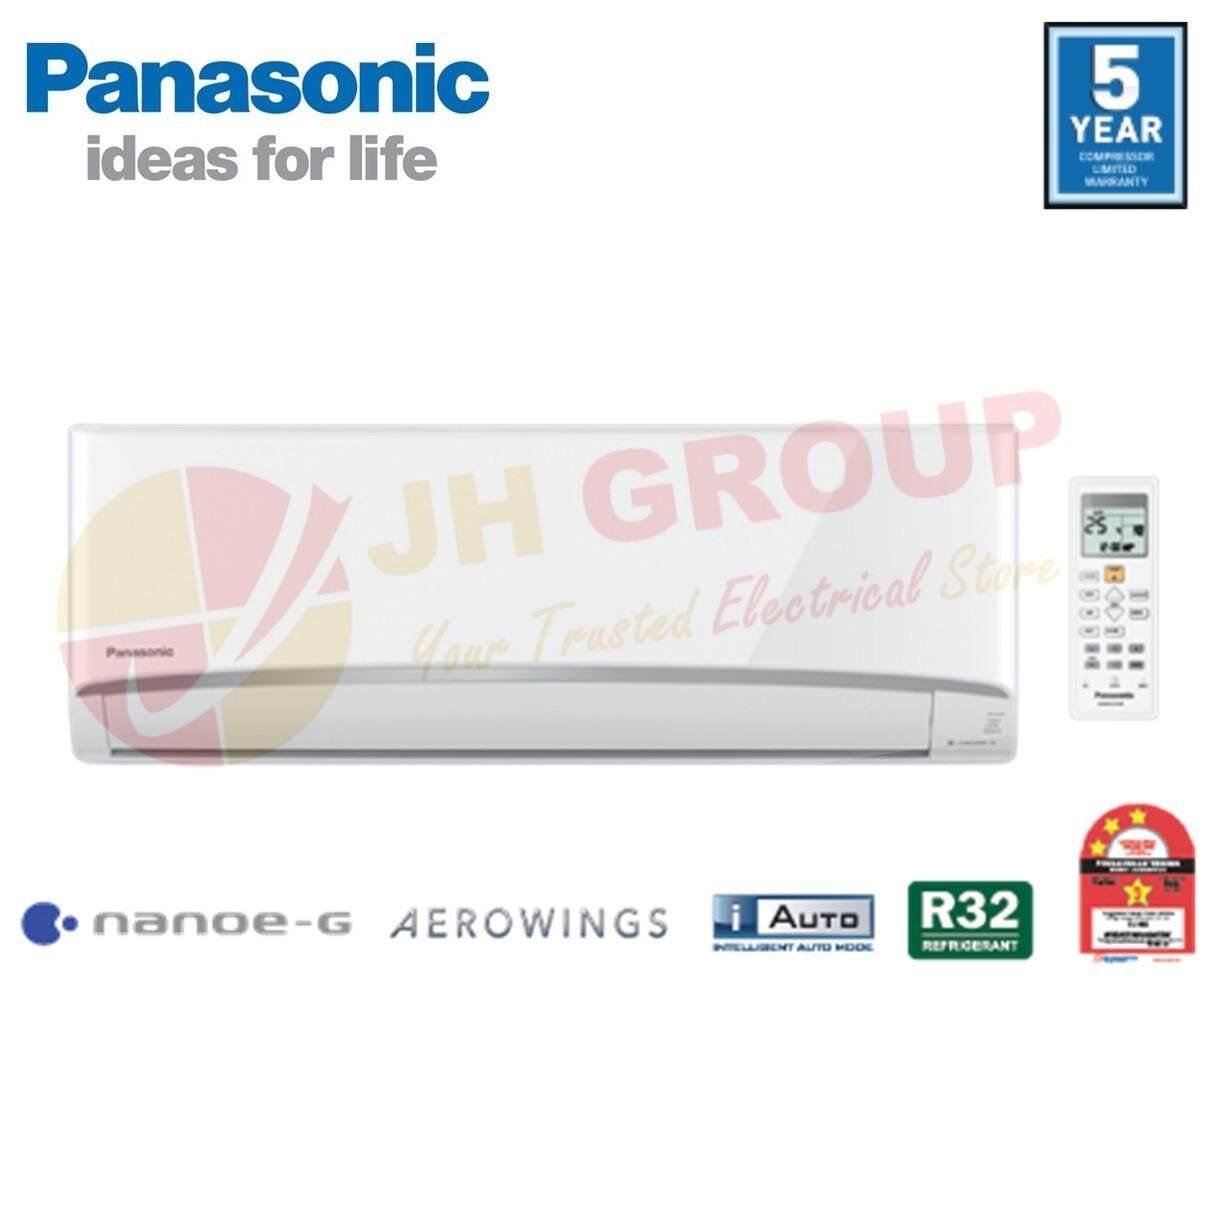 PANASONIC CS-N12VKH / CU-N12VKH 1.5 HP DELUXE NON-INVERTER R32 AERO SERIES AIR-CONDITIONER